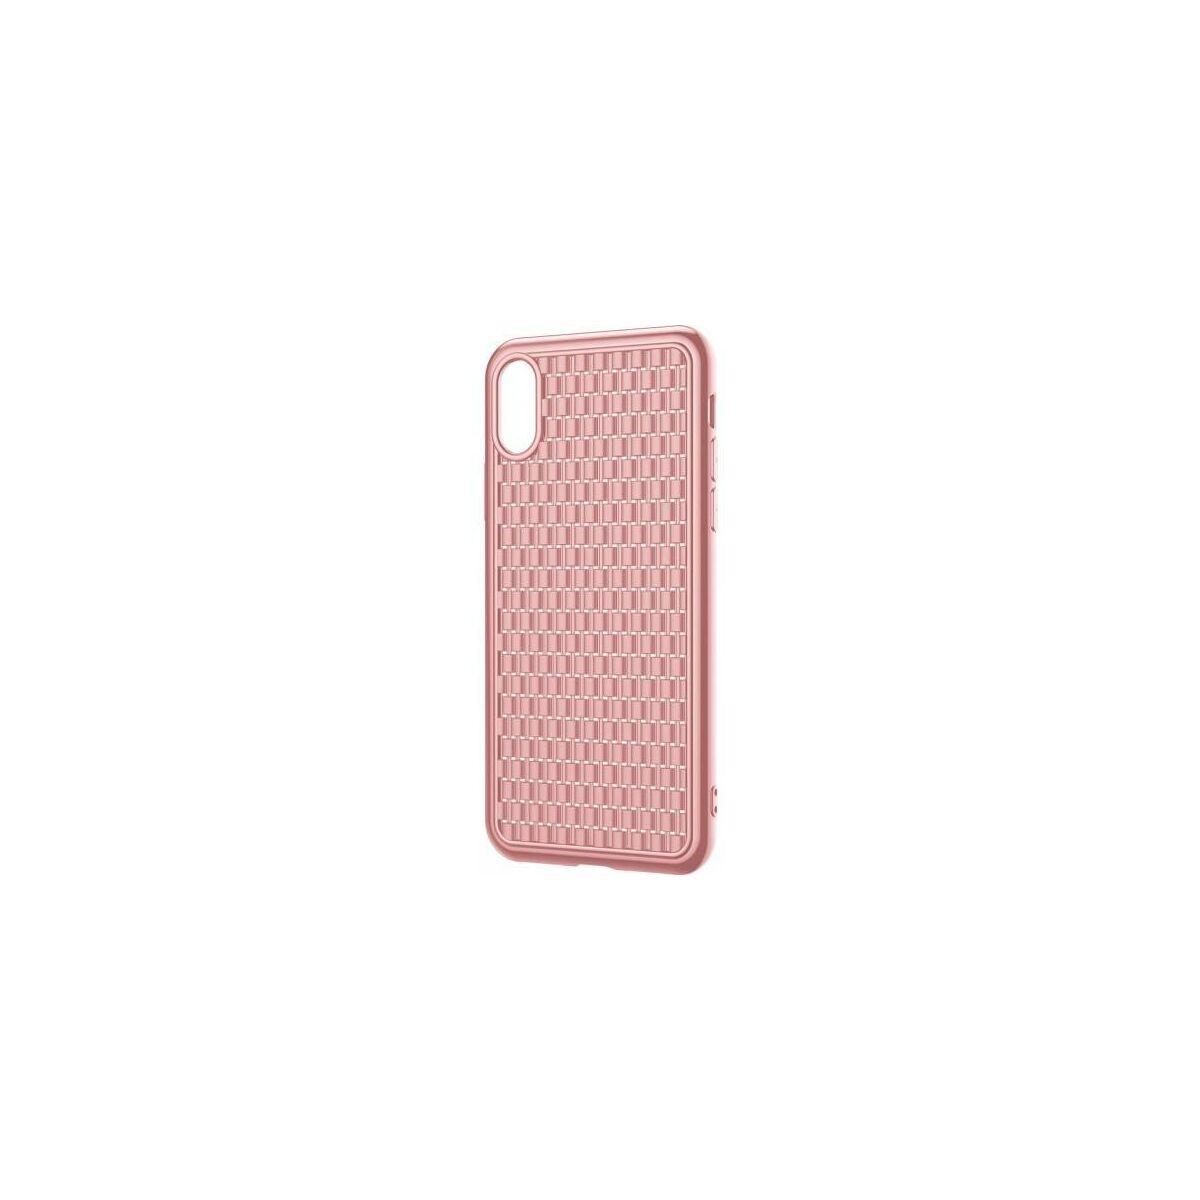 Baseus iPhone XS Max tok, BV, 2.generációs, rózsaszín (WIAPIPH65-BV04)